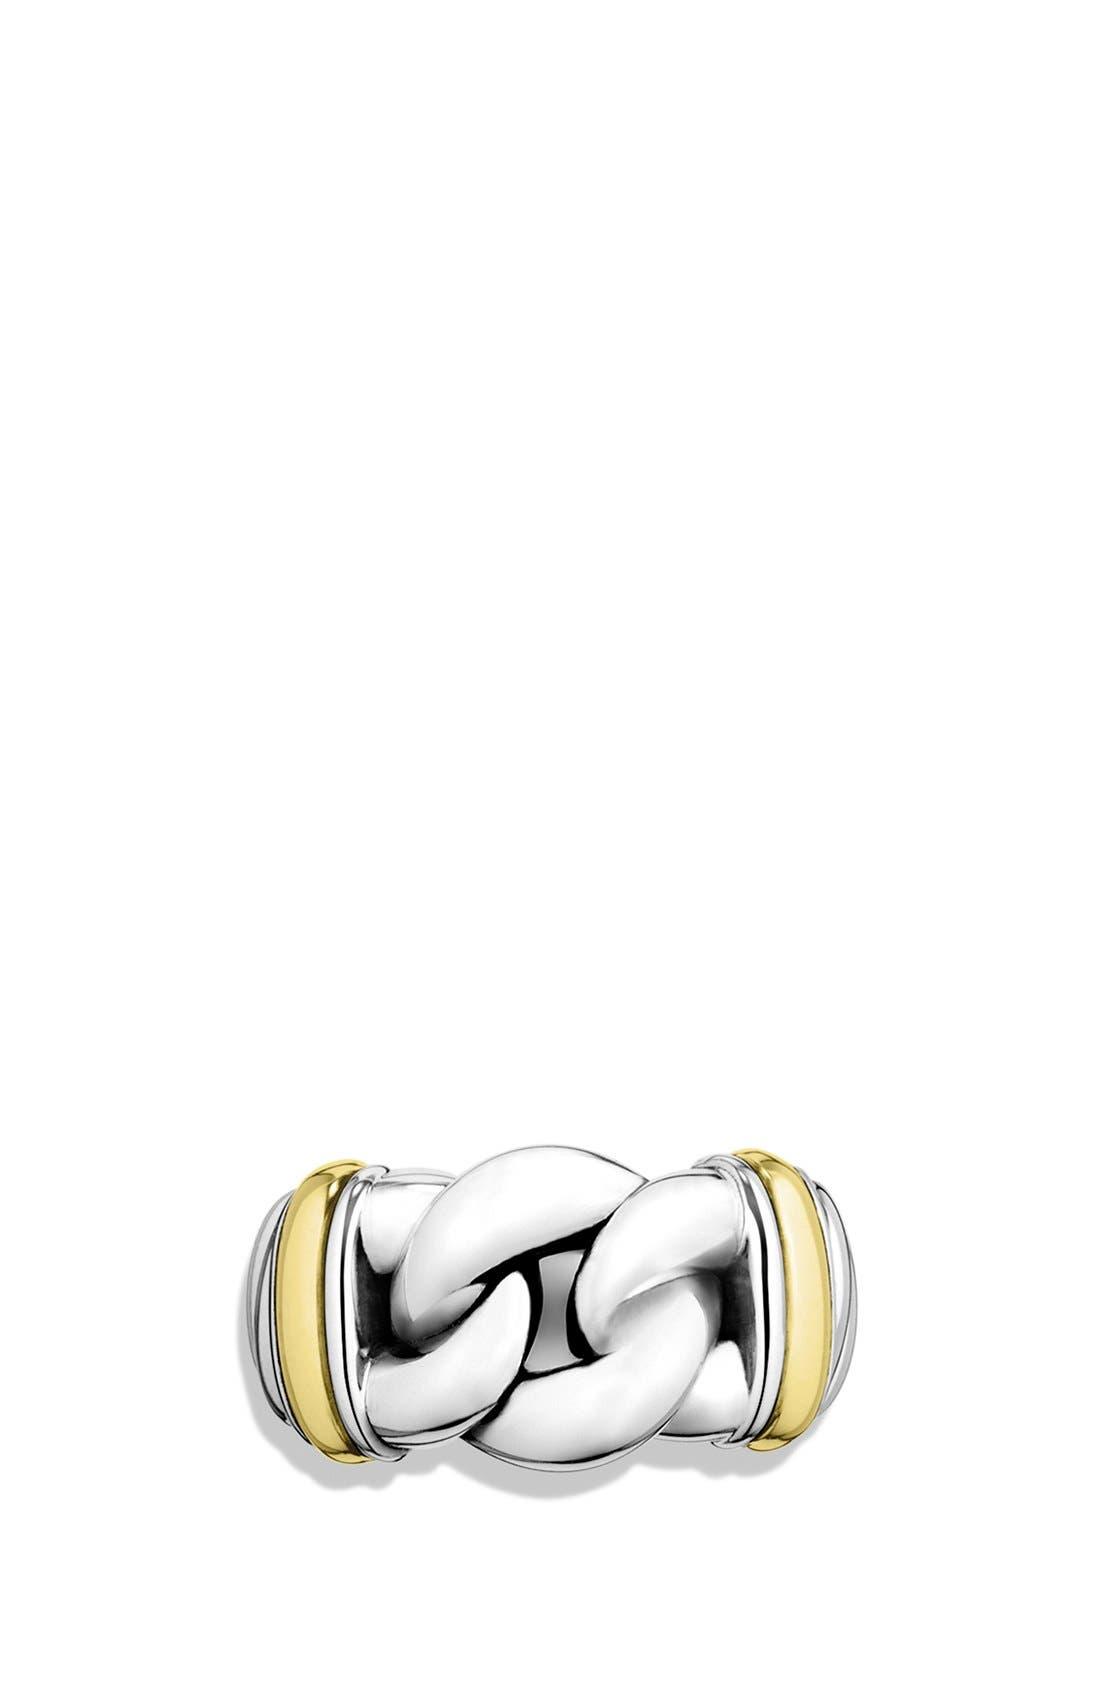 DAVID YURMAN,                             'Metro' Ring with Gold,                             Alternate thumbnail 2, color,                             040